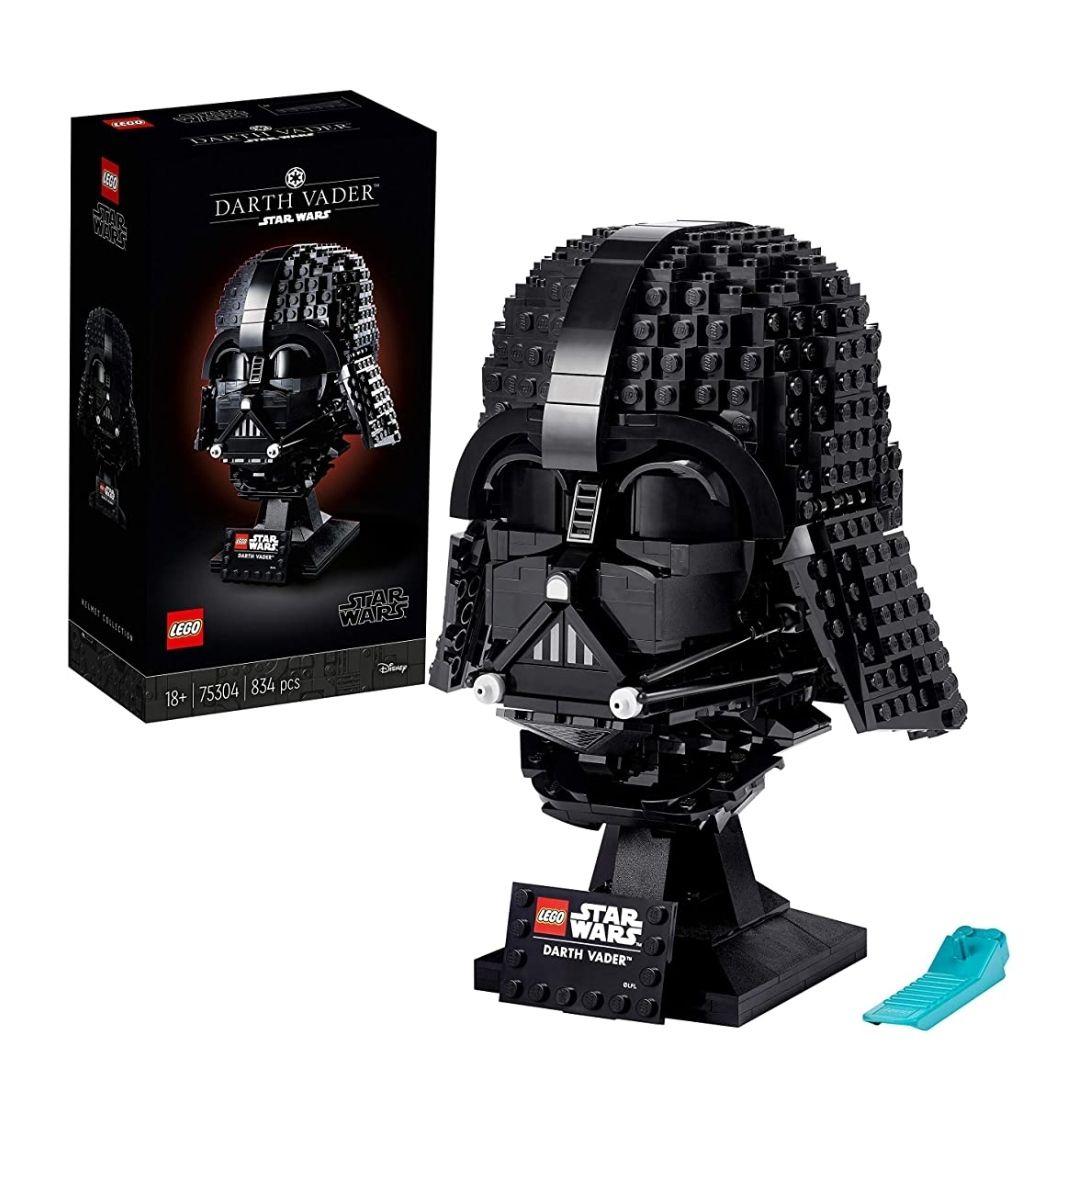 Casco Darth Vader de lego